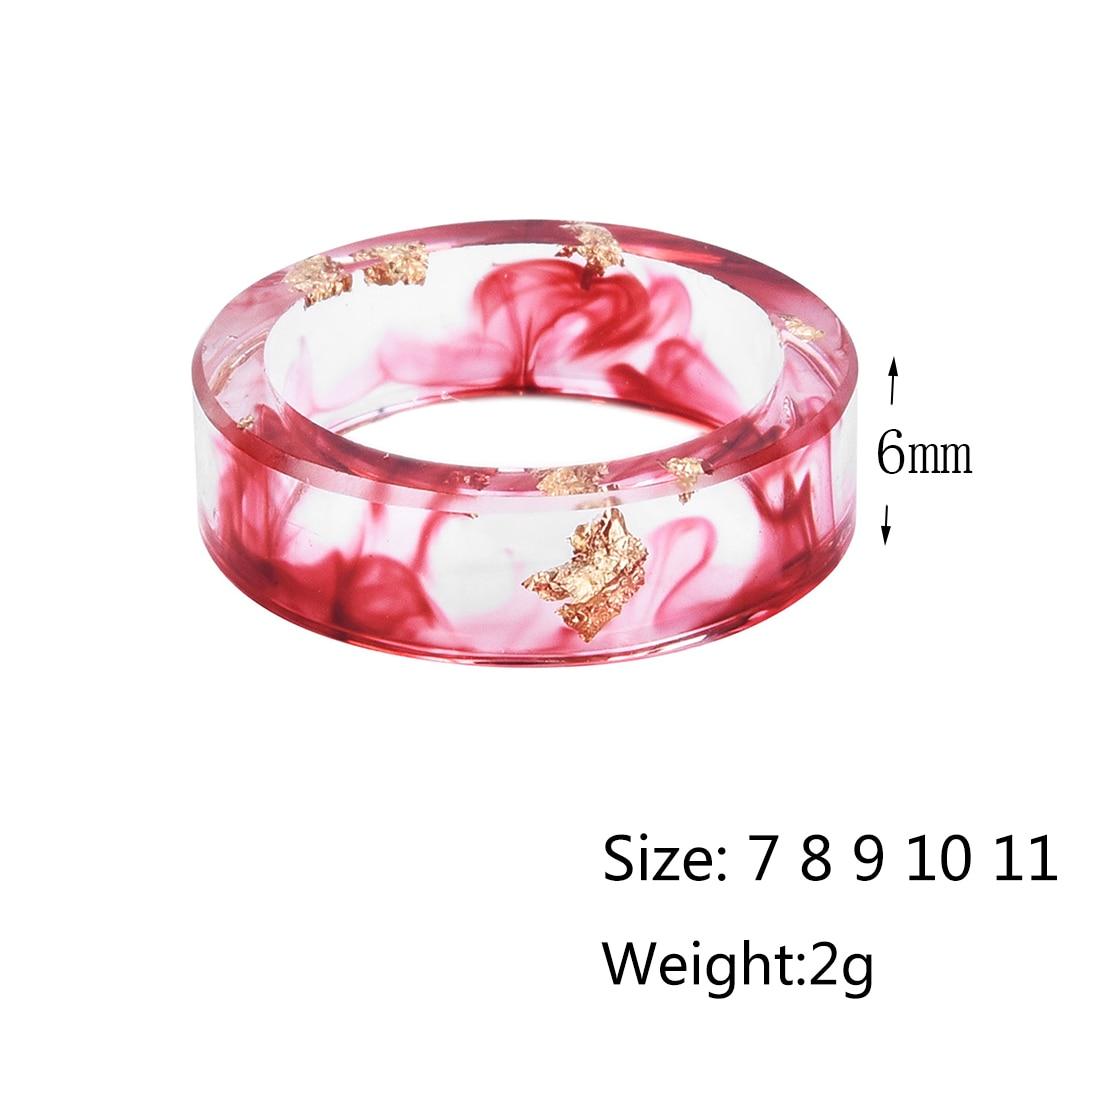 LIEBE ENGEL Hot Sale 8 Colors Gold Foil Paper Inside Resin Ring For ...